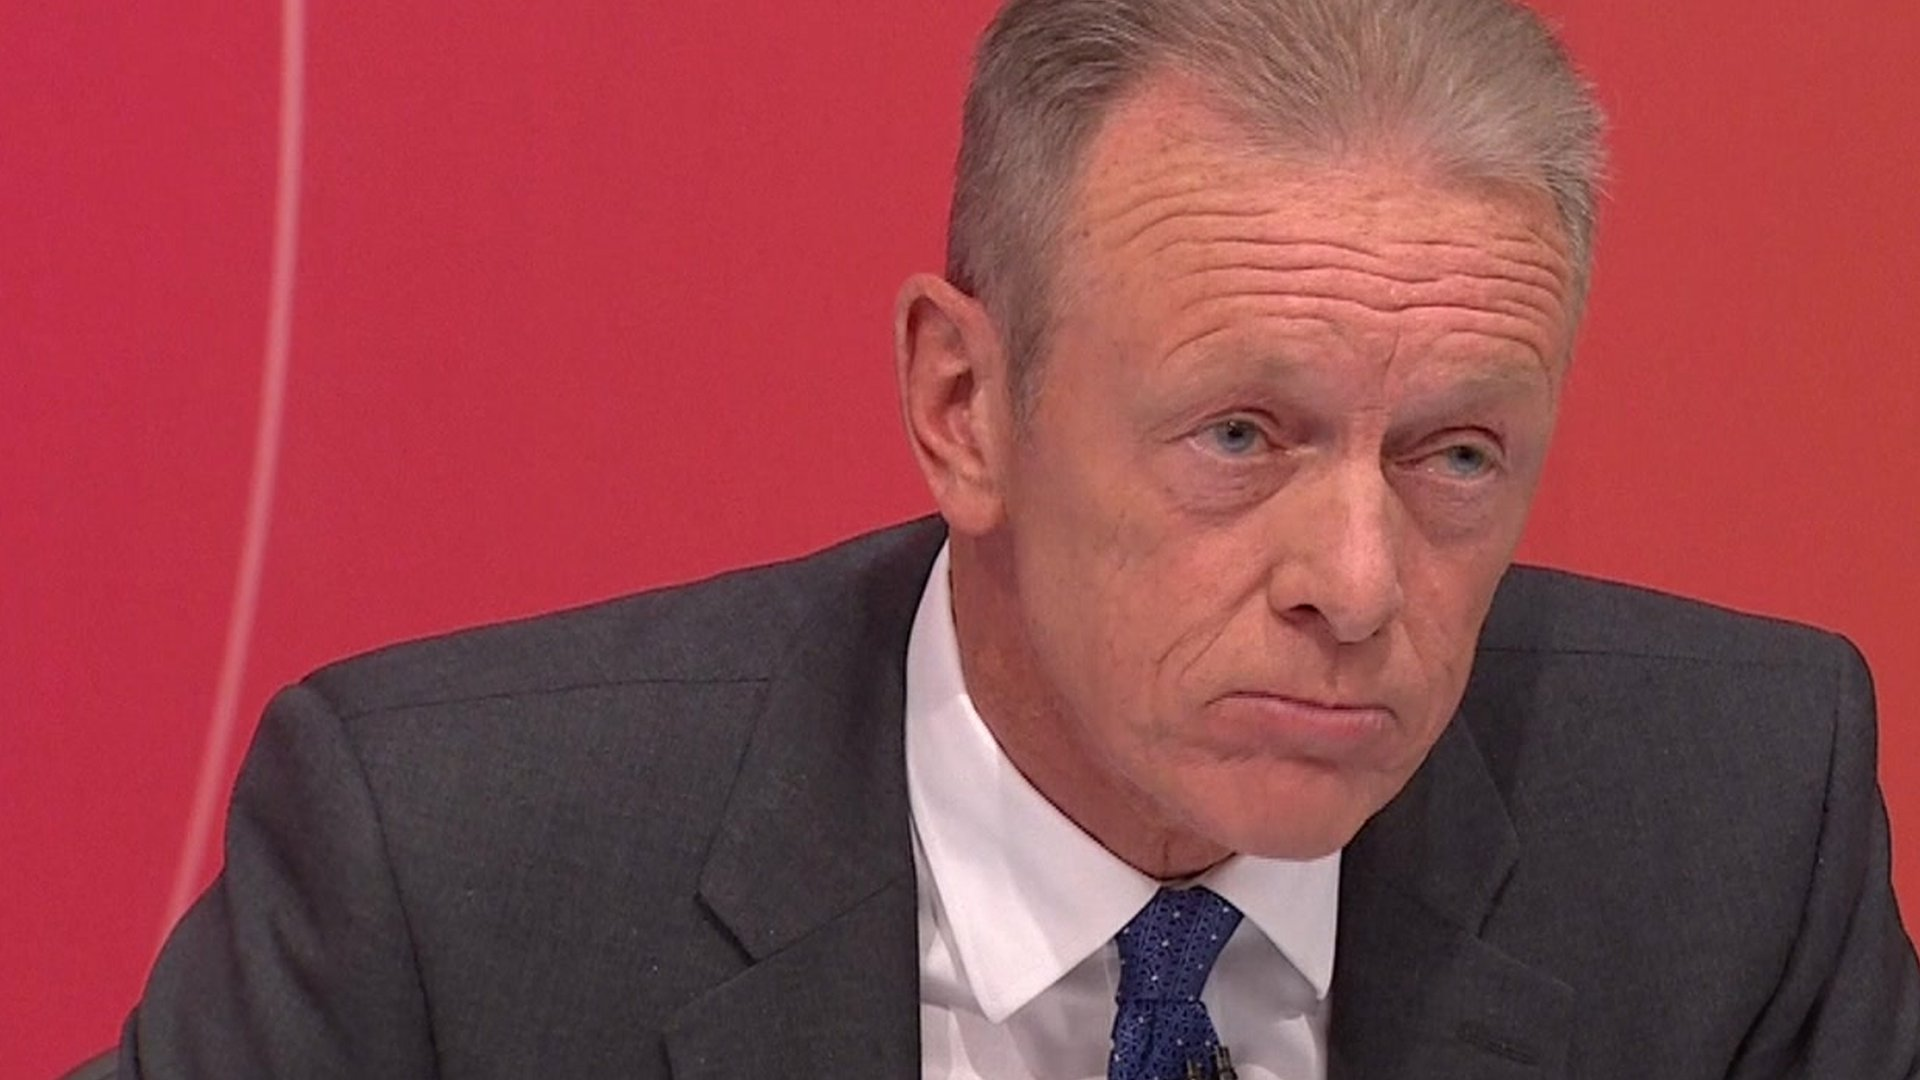 Sir Bernard Hogan-Howe: 'When we see more young men we have seen more crime'.